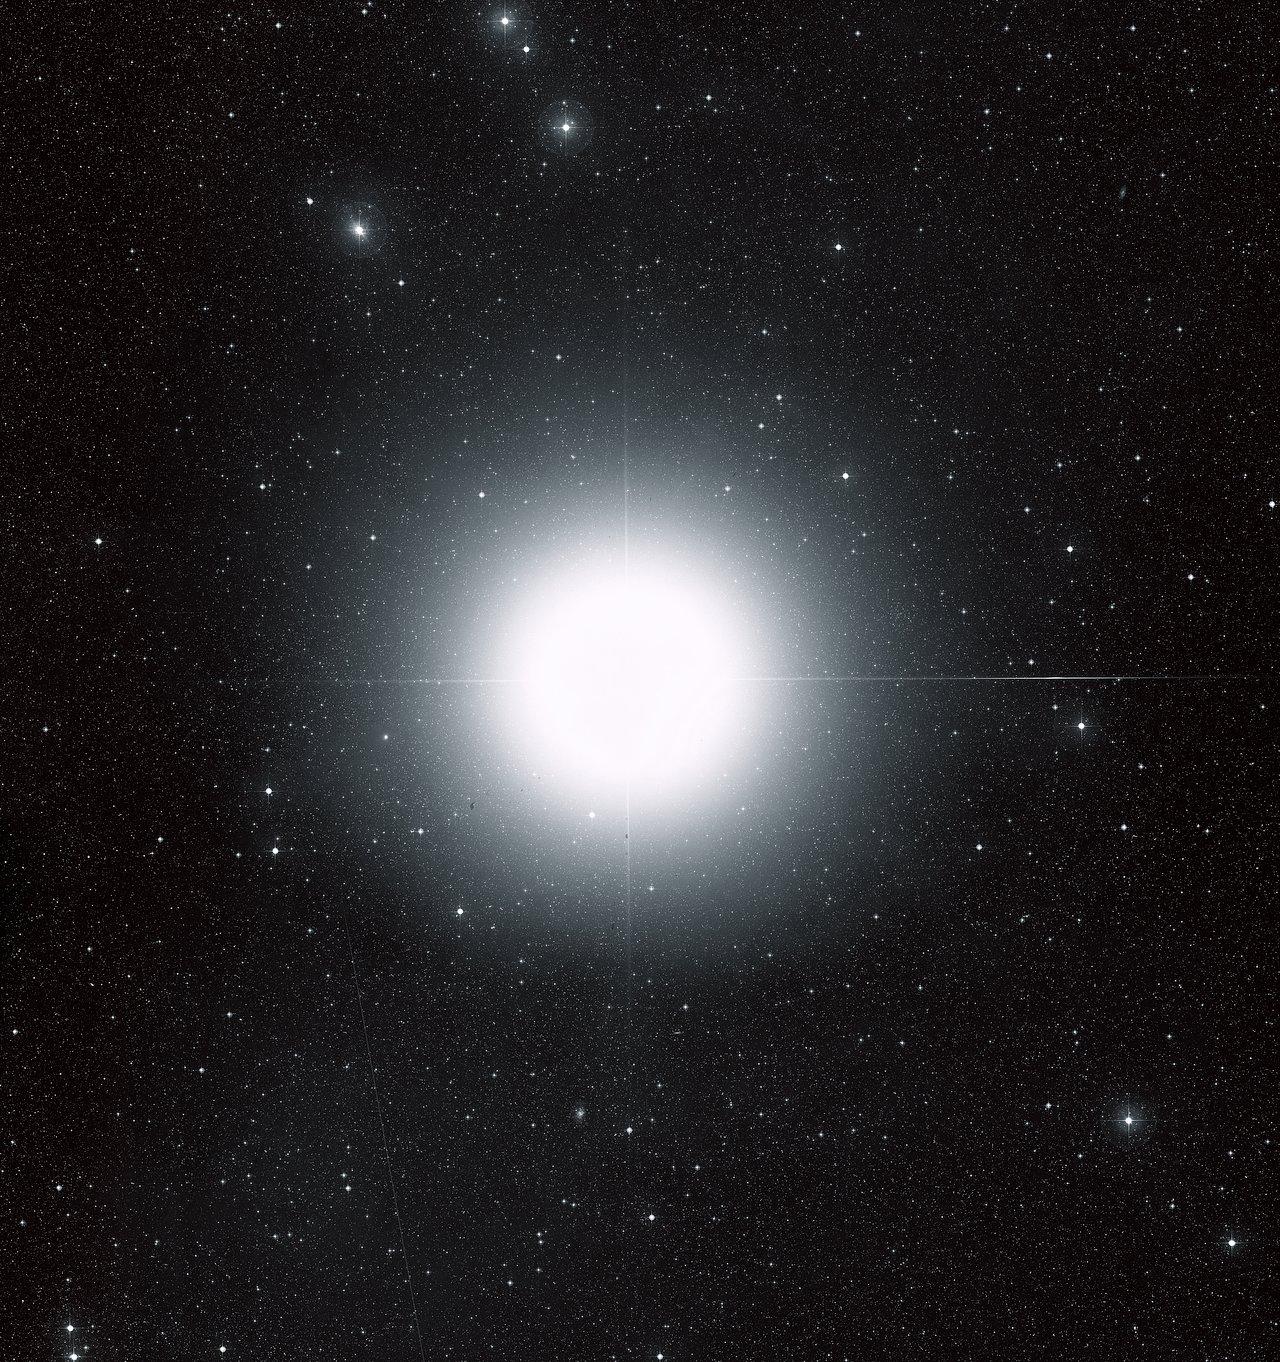 Sirius Ground Based Image Esa Hubble